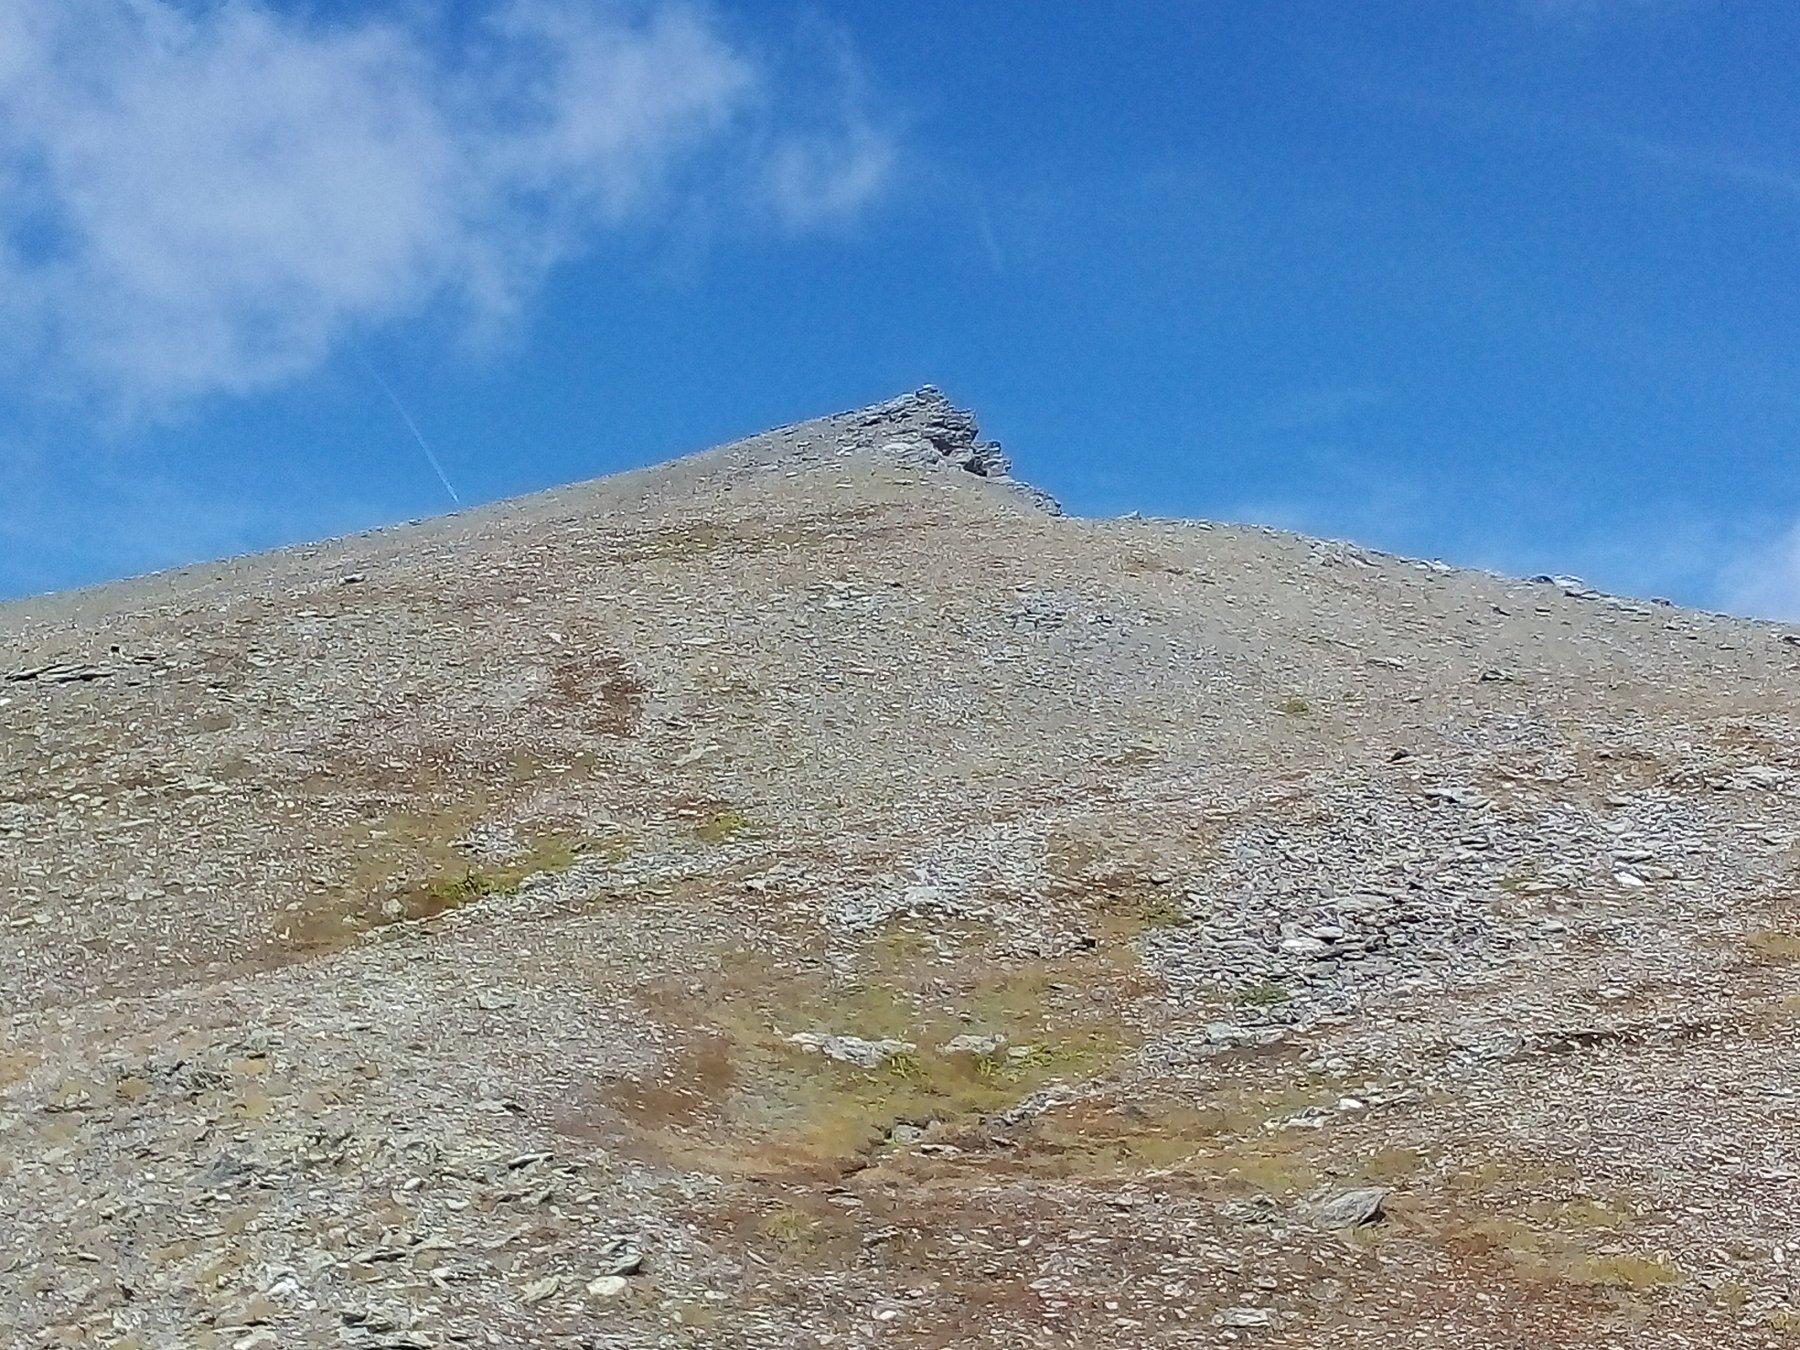 La punta Rasis vista dai pressi del colle Rasis Ovest.